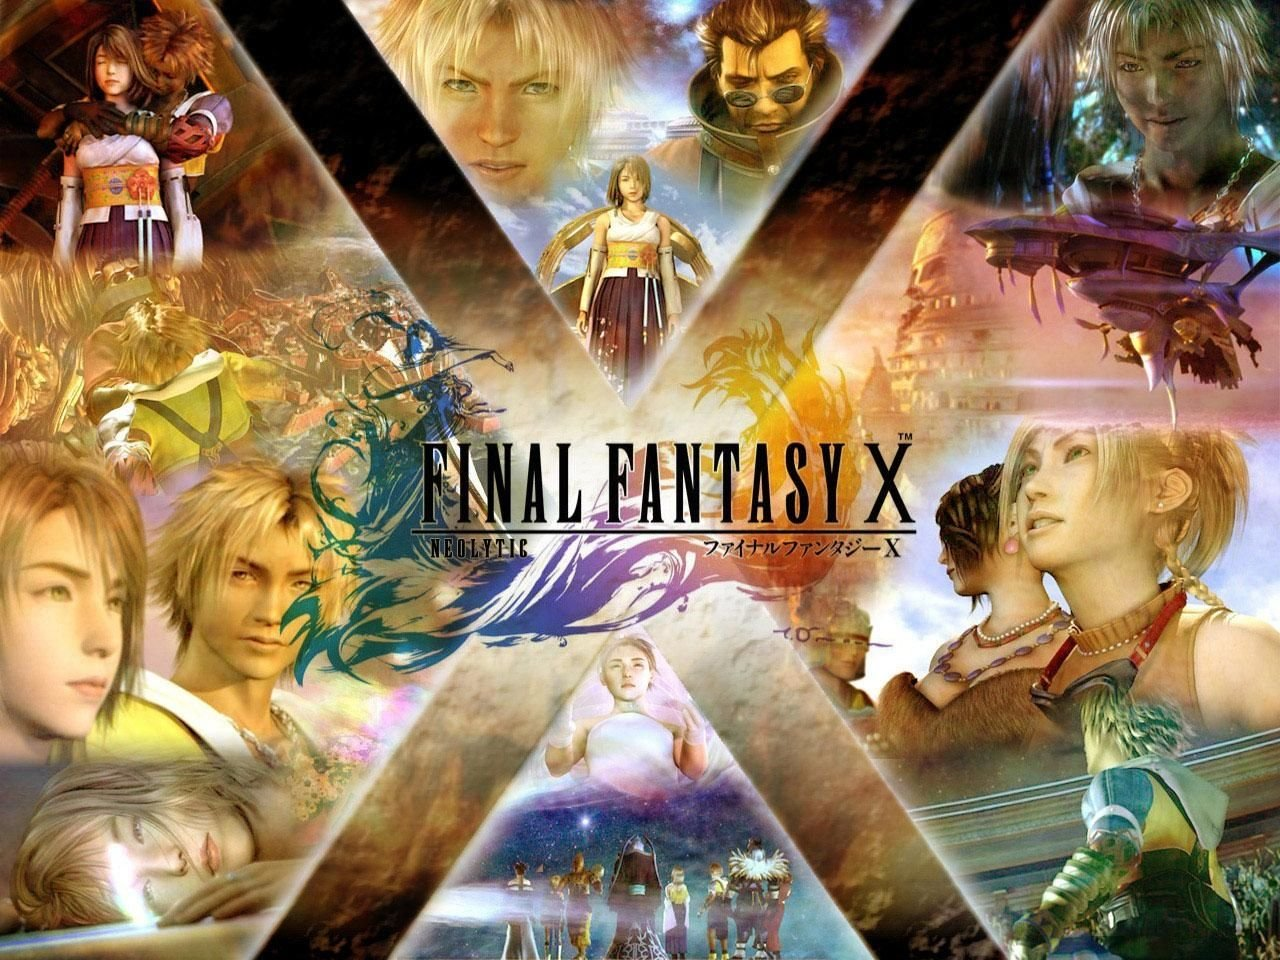 Final Fantasy X Wallpapers wallpaper Final Fantasy X Wallpapers hd 1280x960